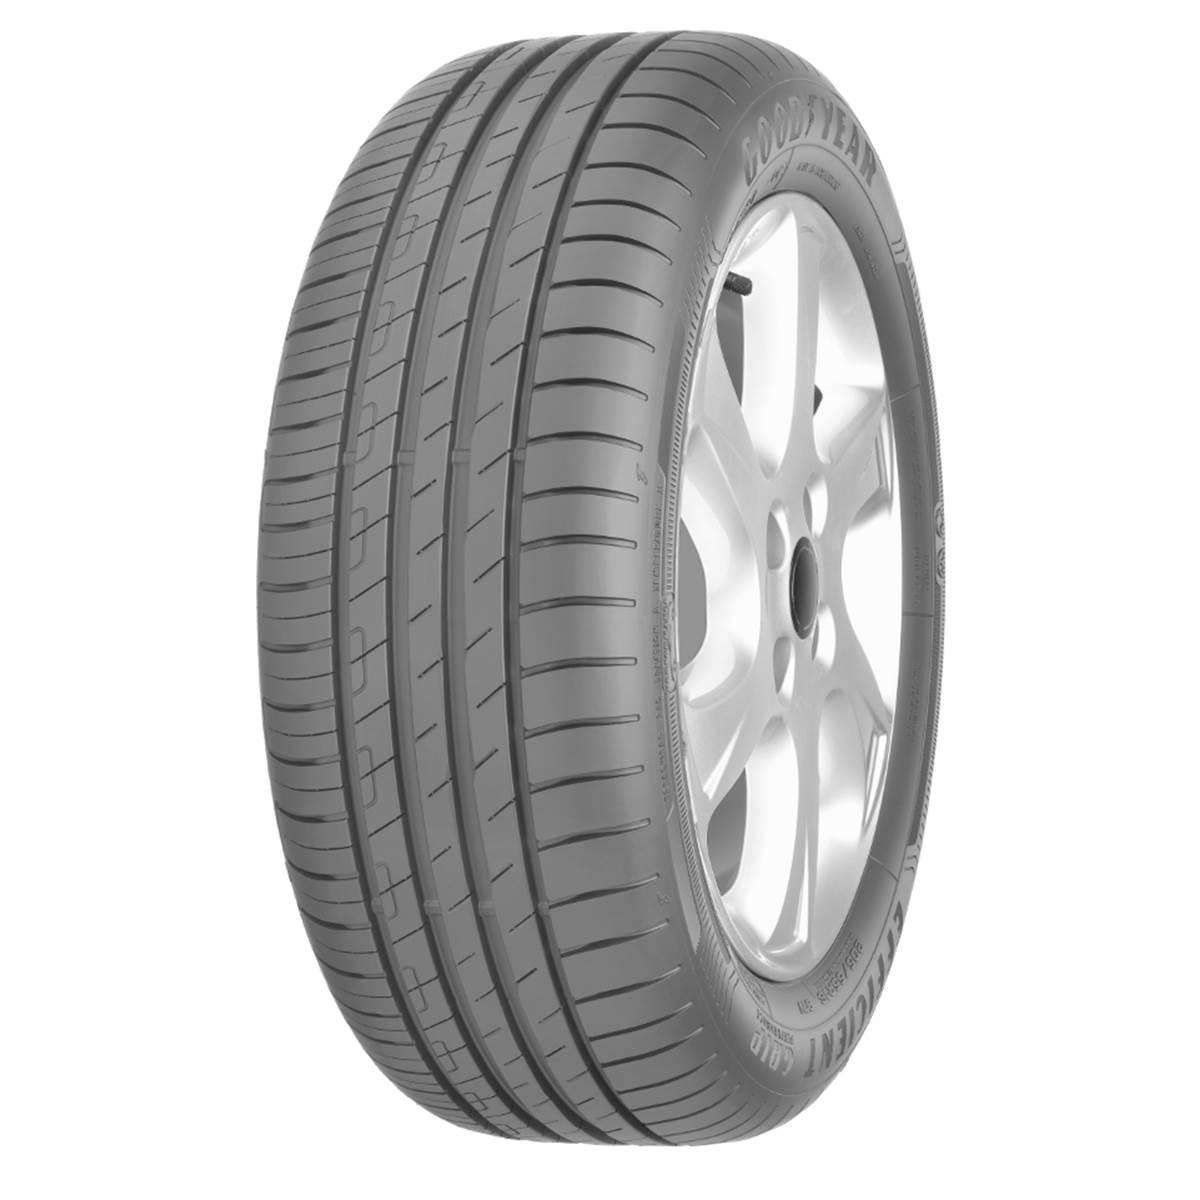 Goodyear EfficientGrip XL pneu